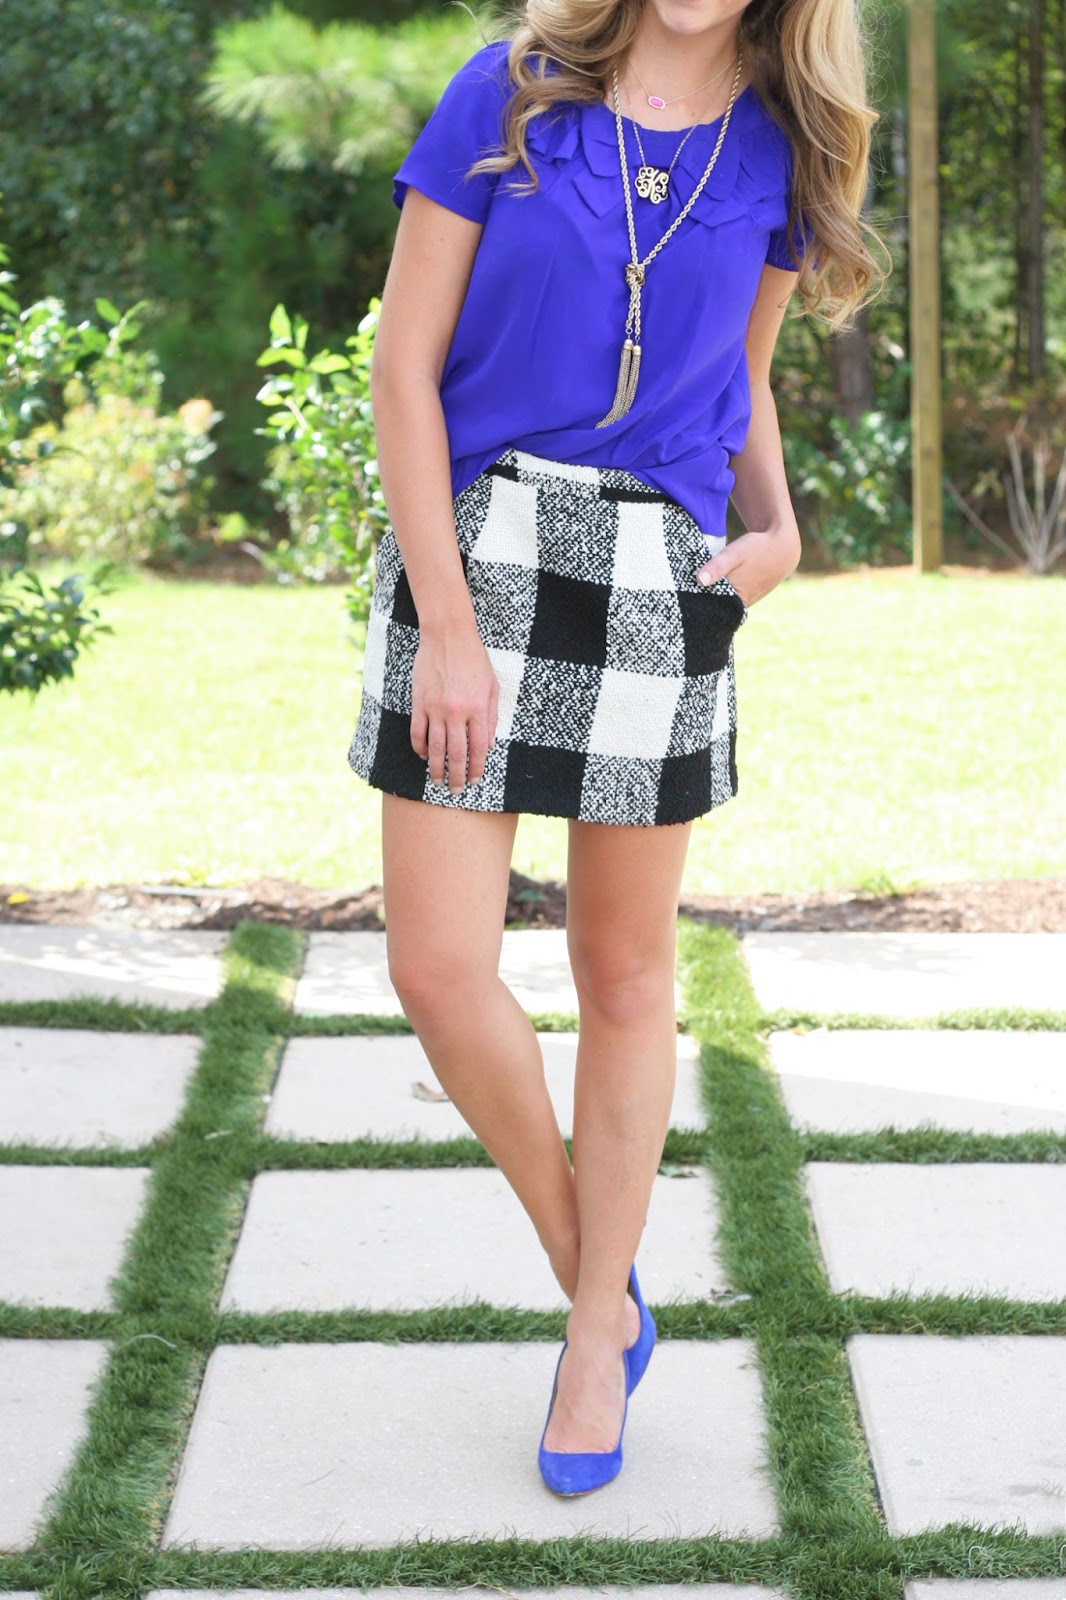 Large-black-and-white-Check-patterned-pocket-skirt